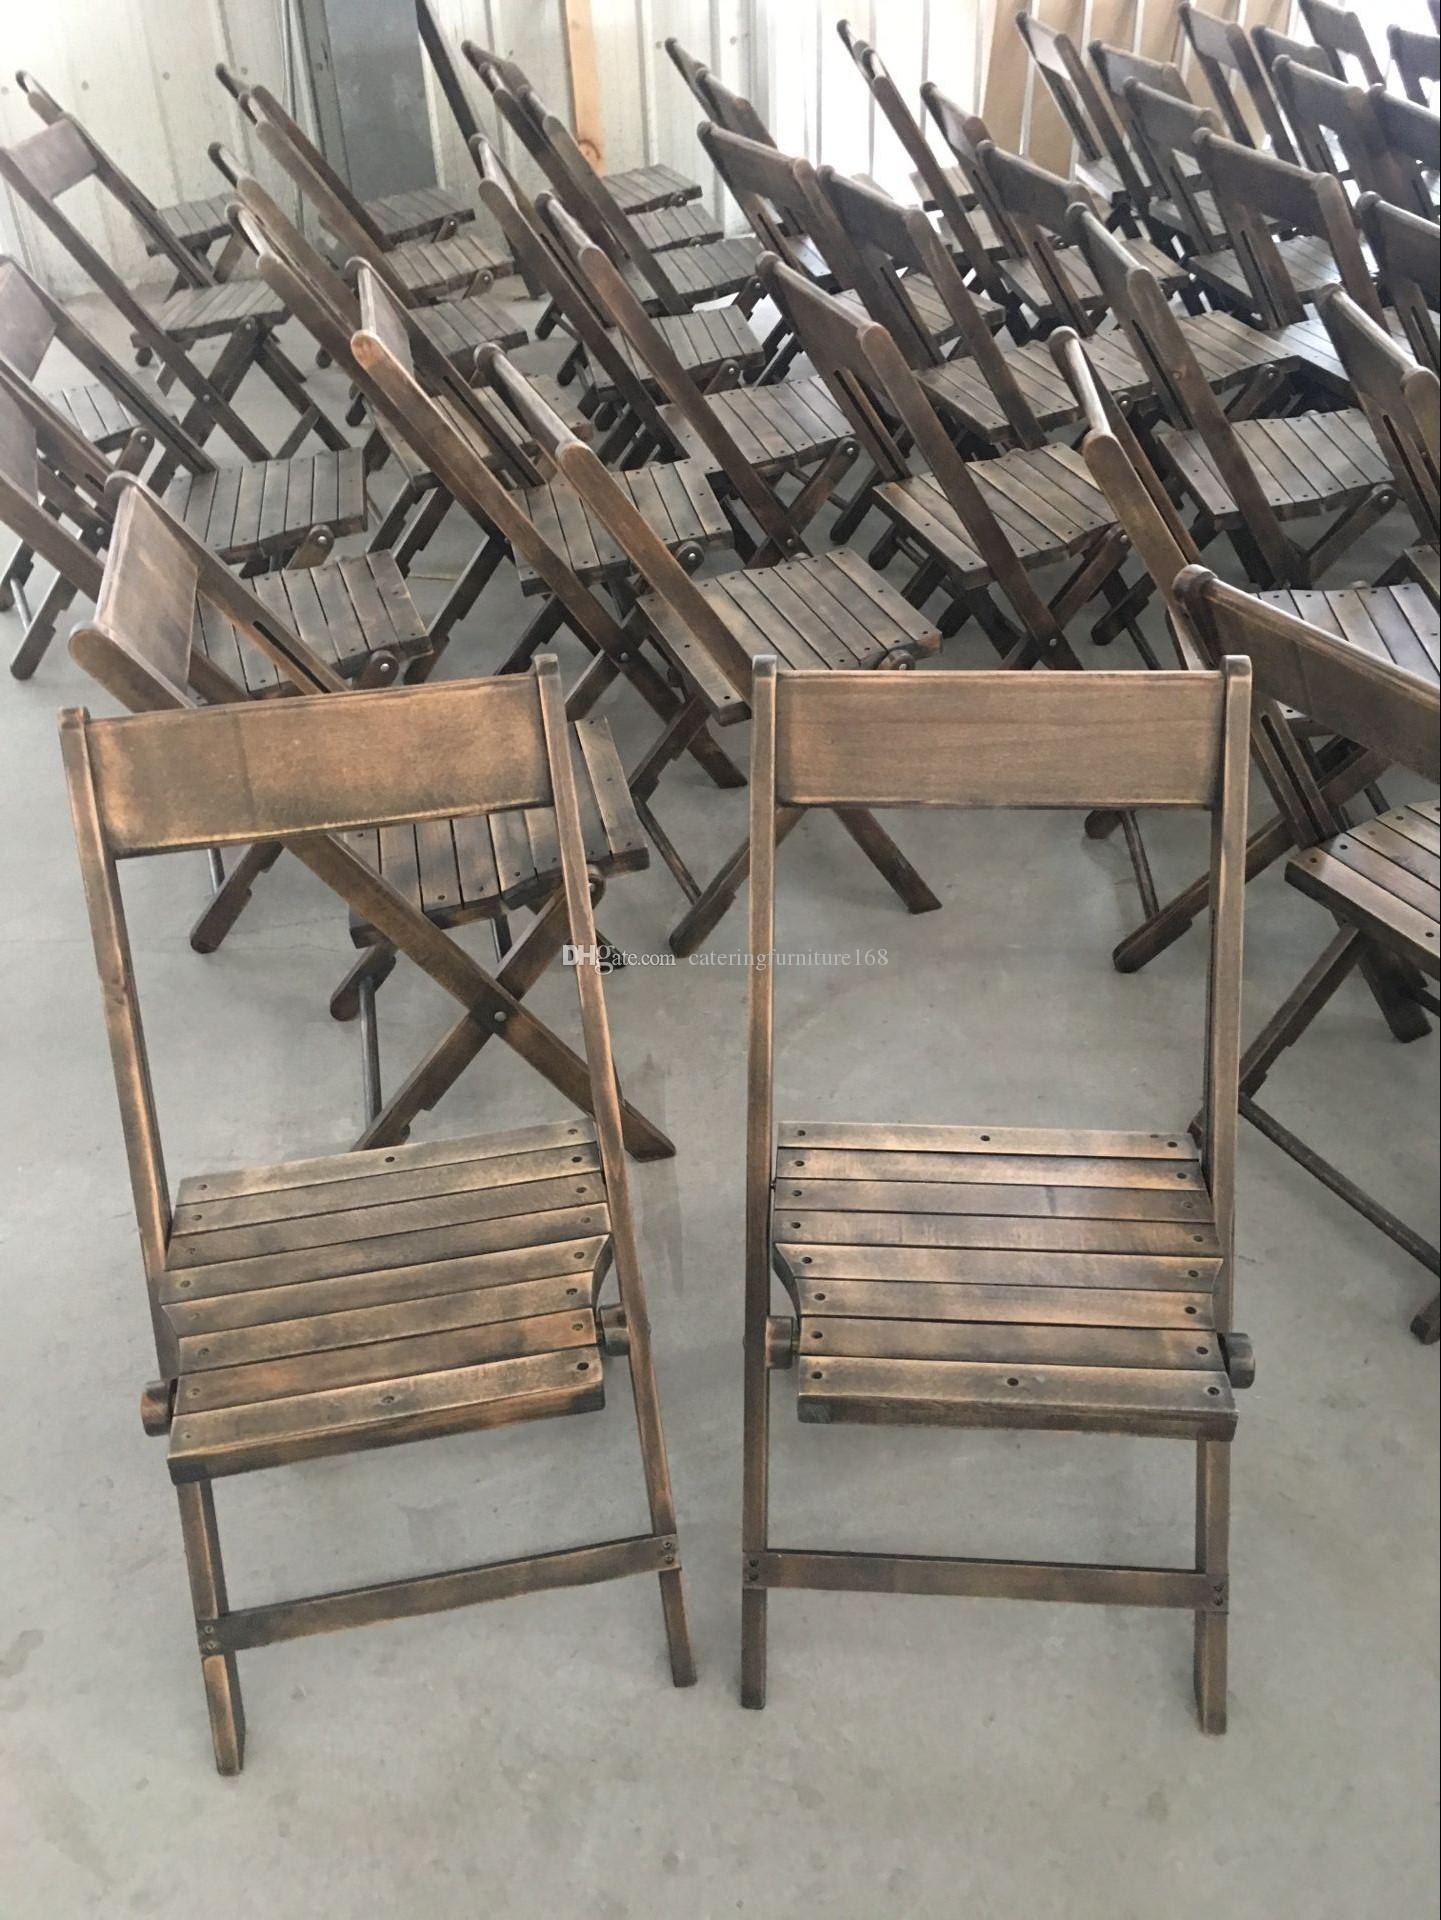 Bon Compre Sillas Plegables Envejecidos Vintage De Madera Para Jardín A $18.6  Del Cateringfurniture168 | DHgate.Com